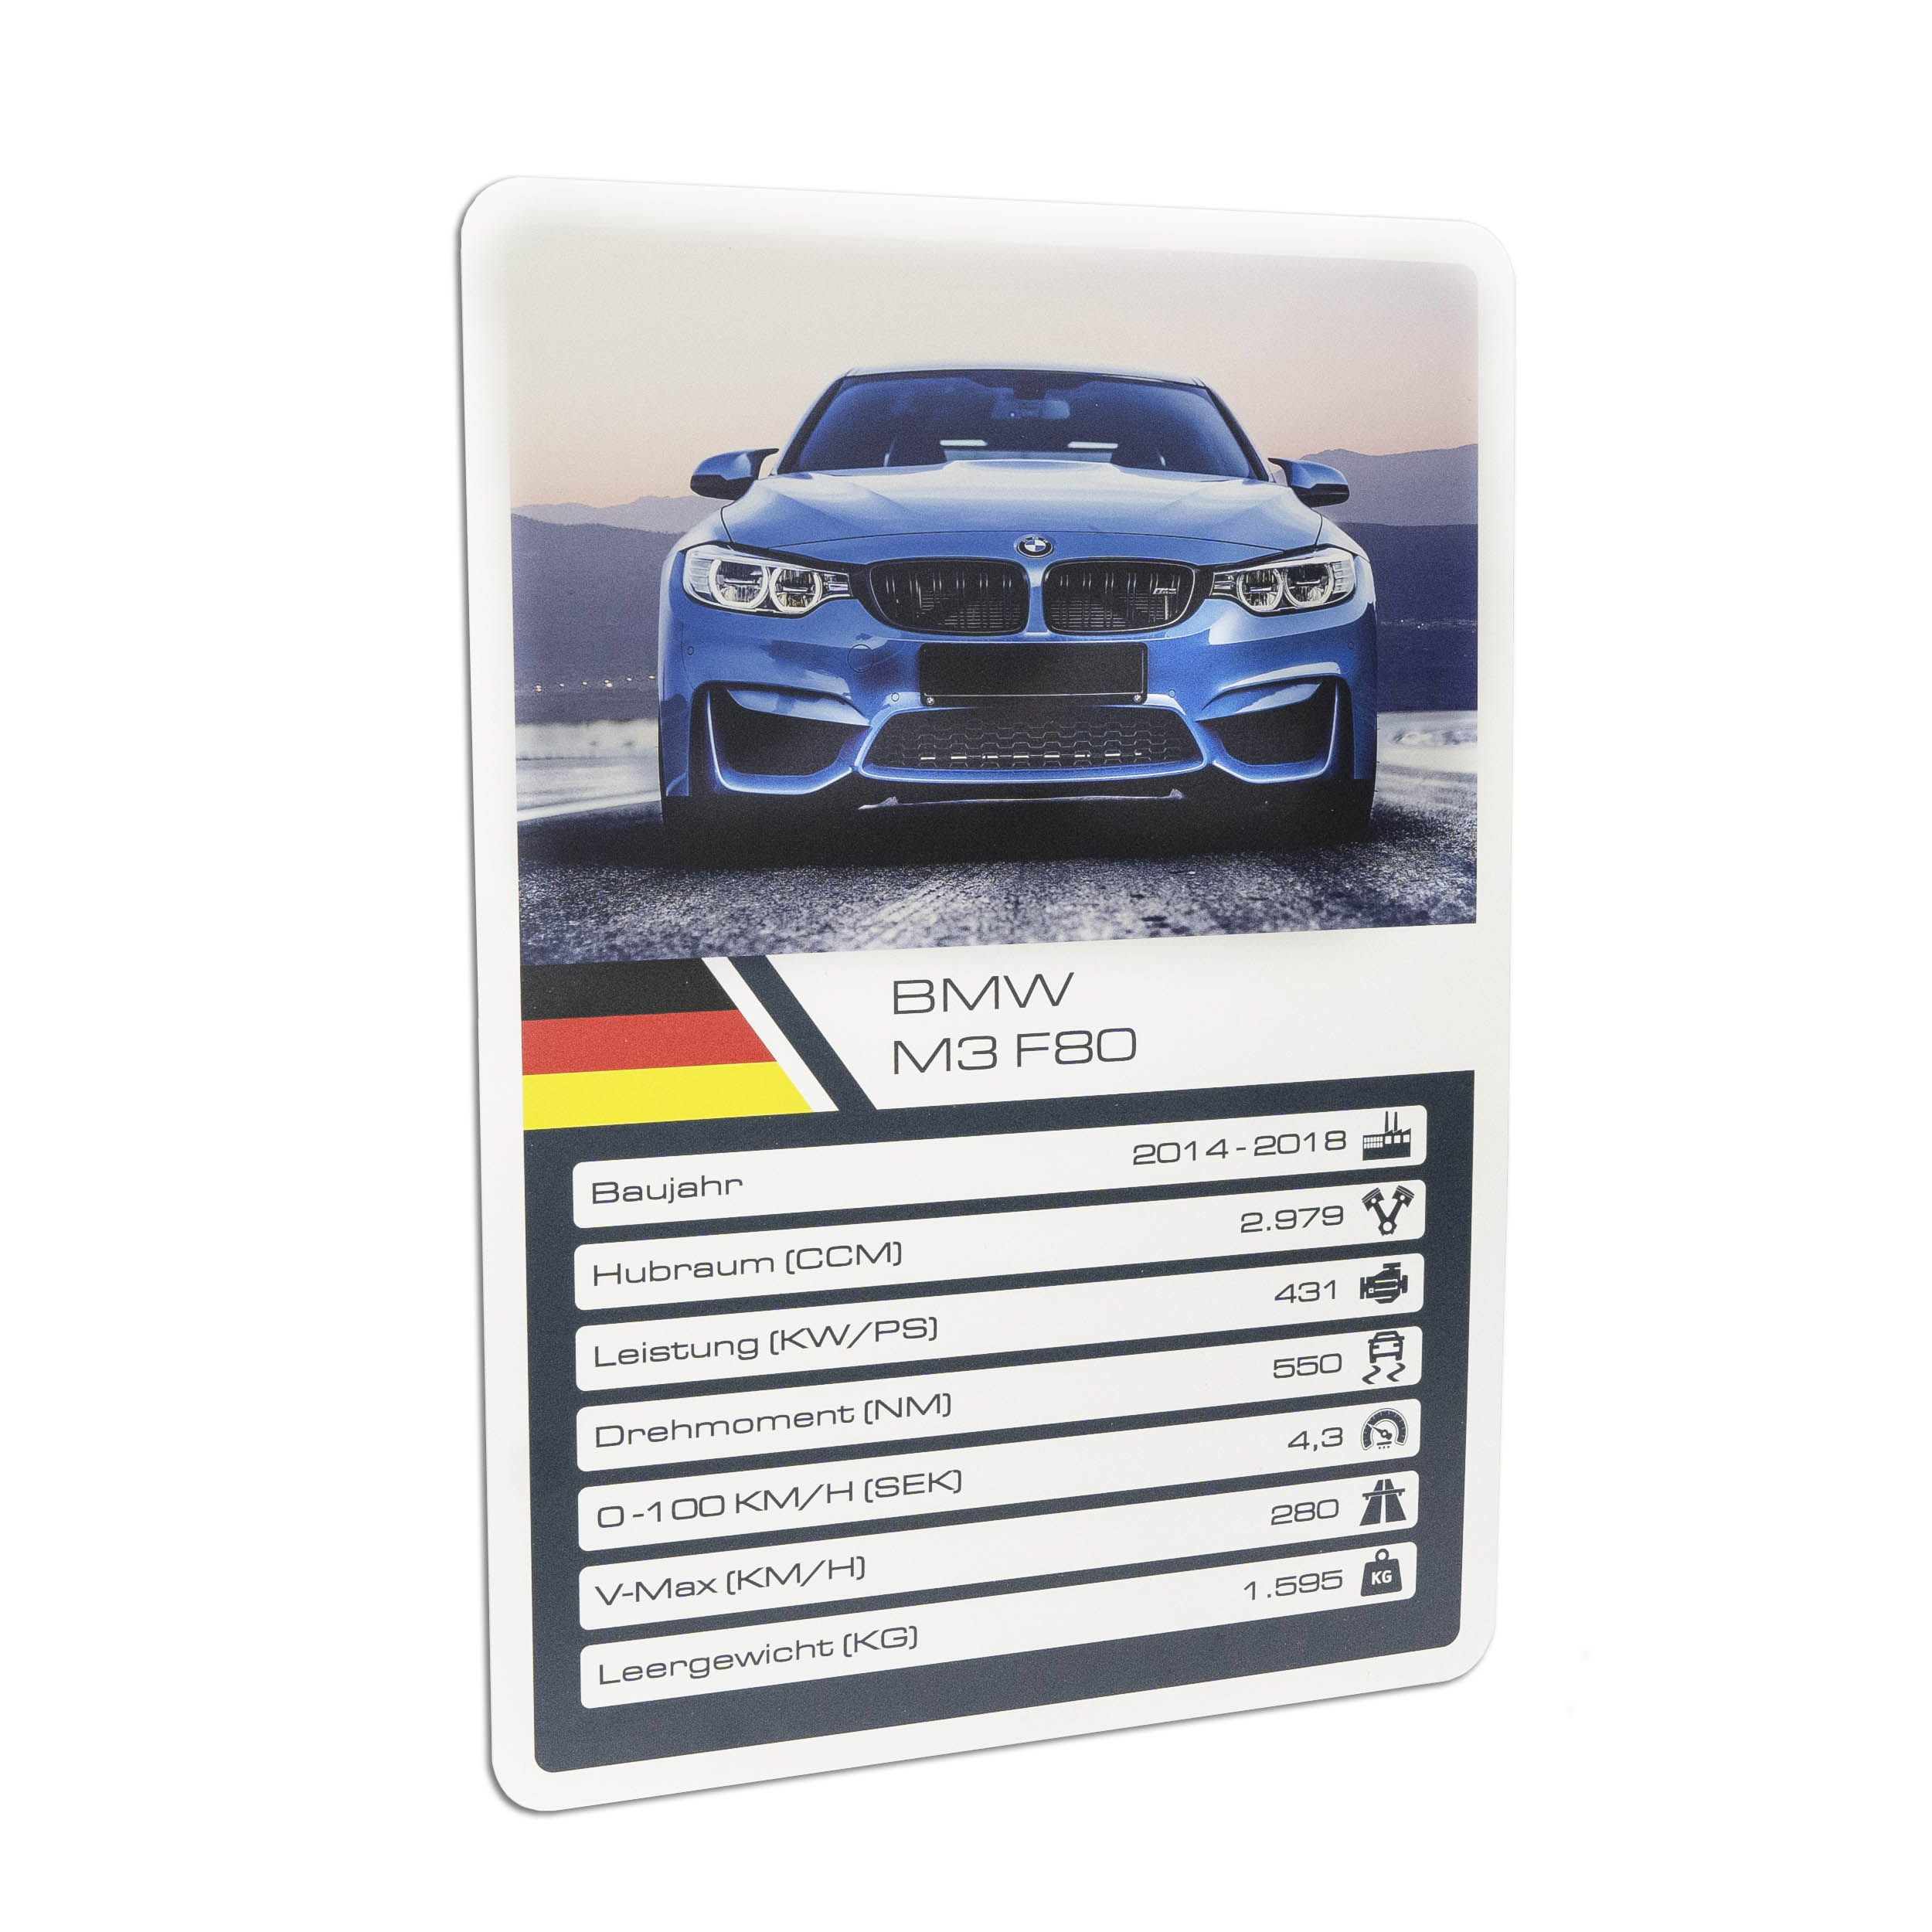 Autokarte Quartettkarte Car card für AUTOLIEBHABER Oldtimer Rennauto Porsche BMW VW etc.